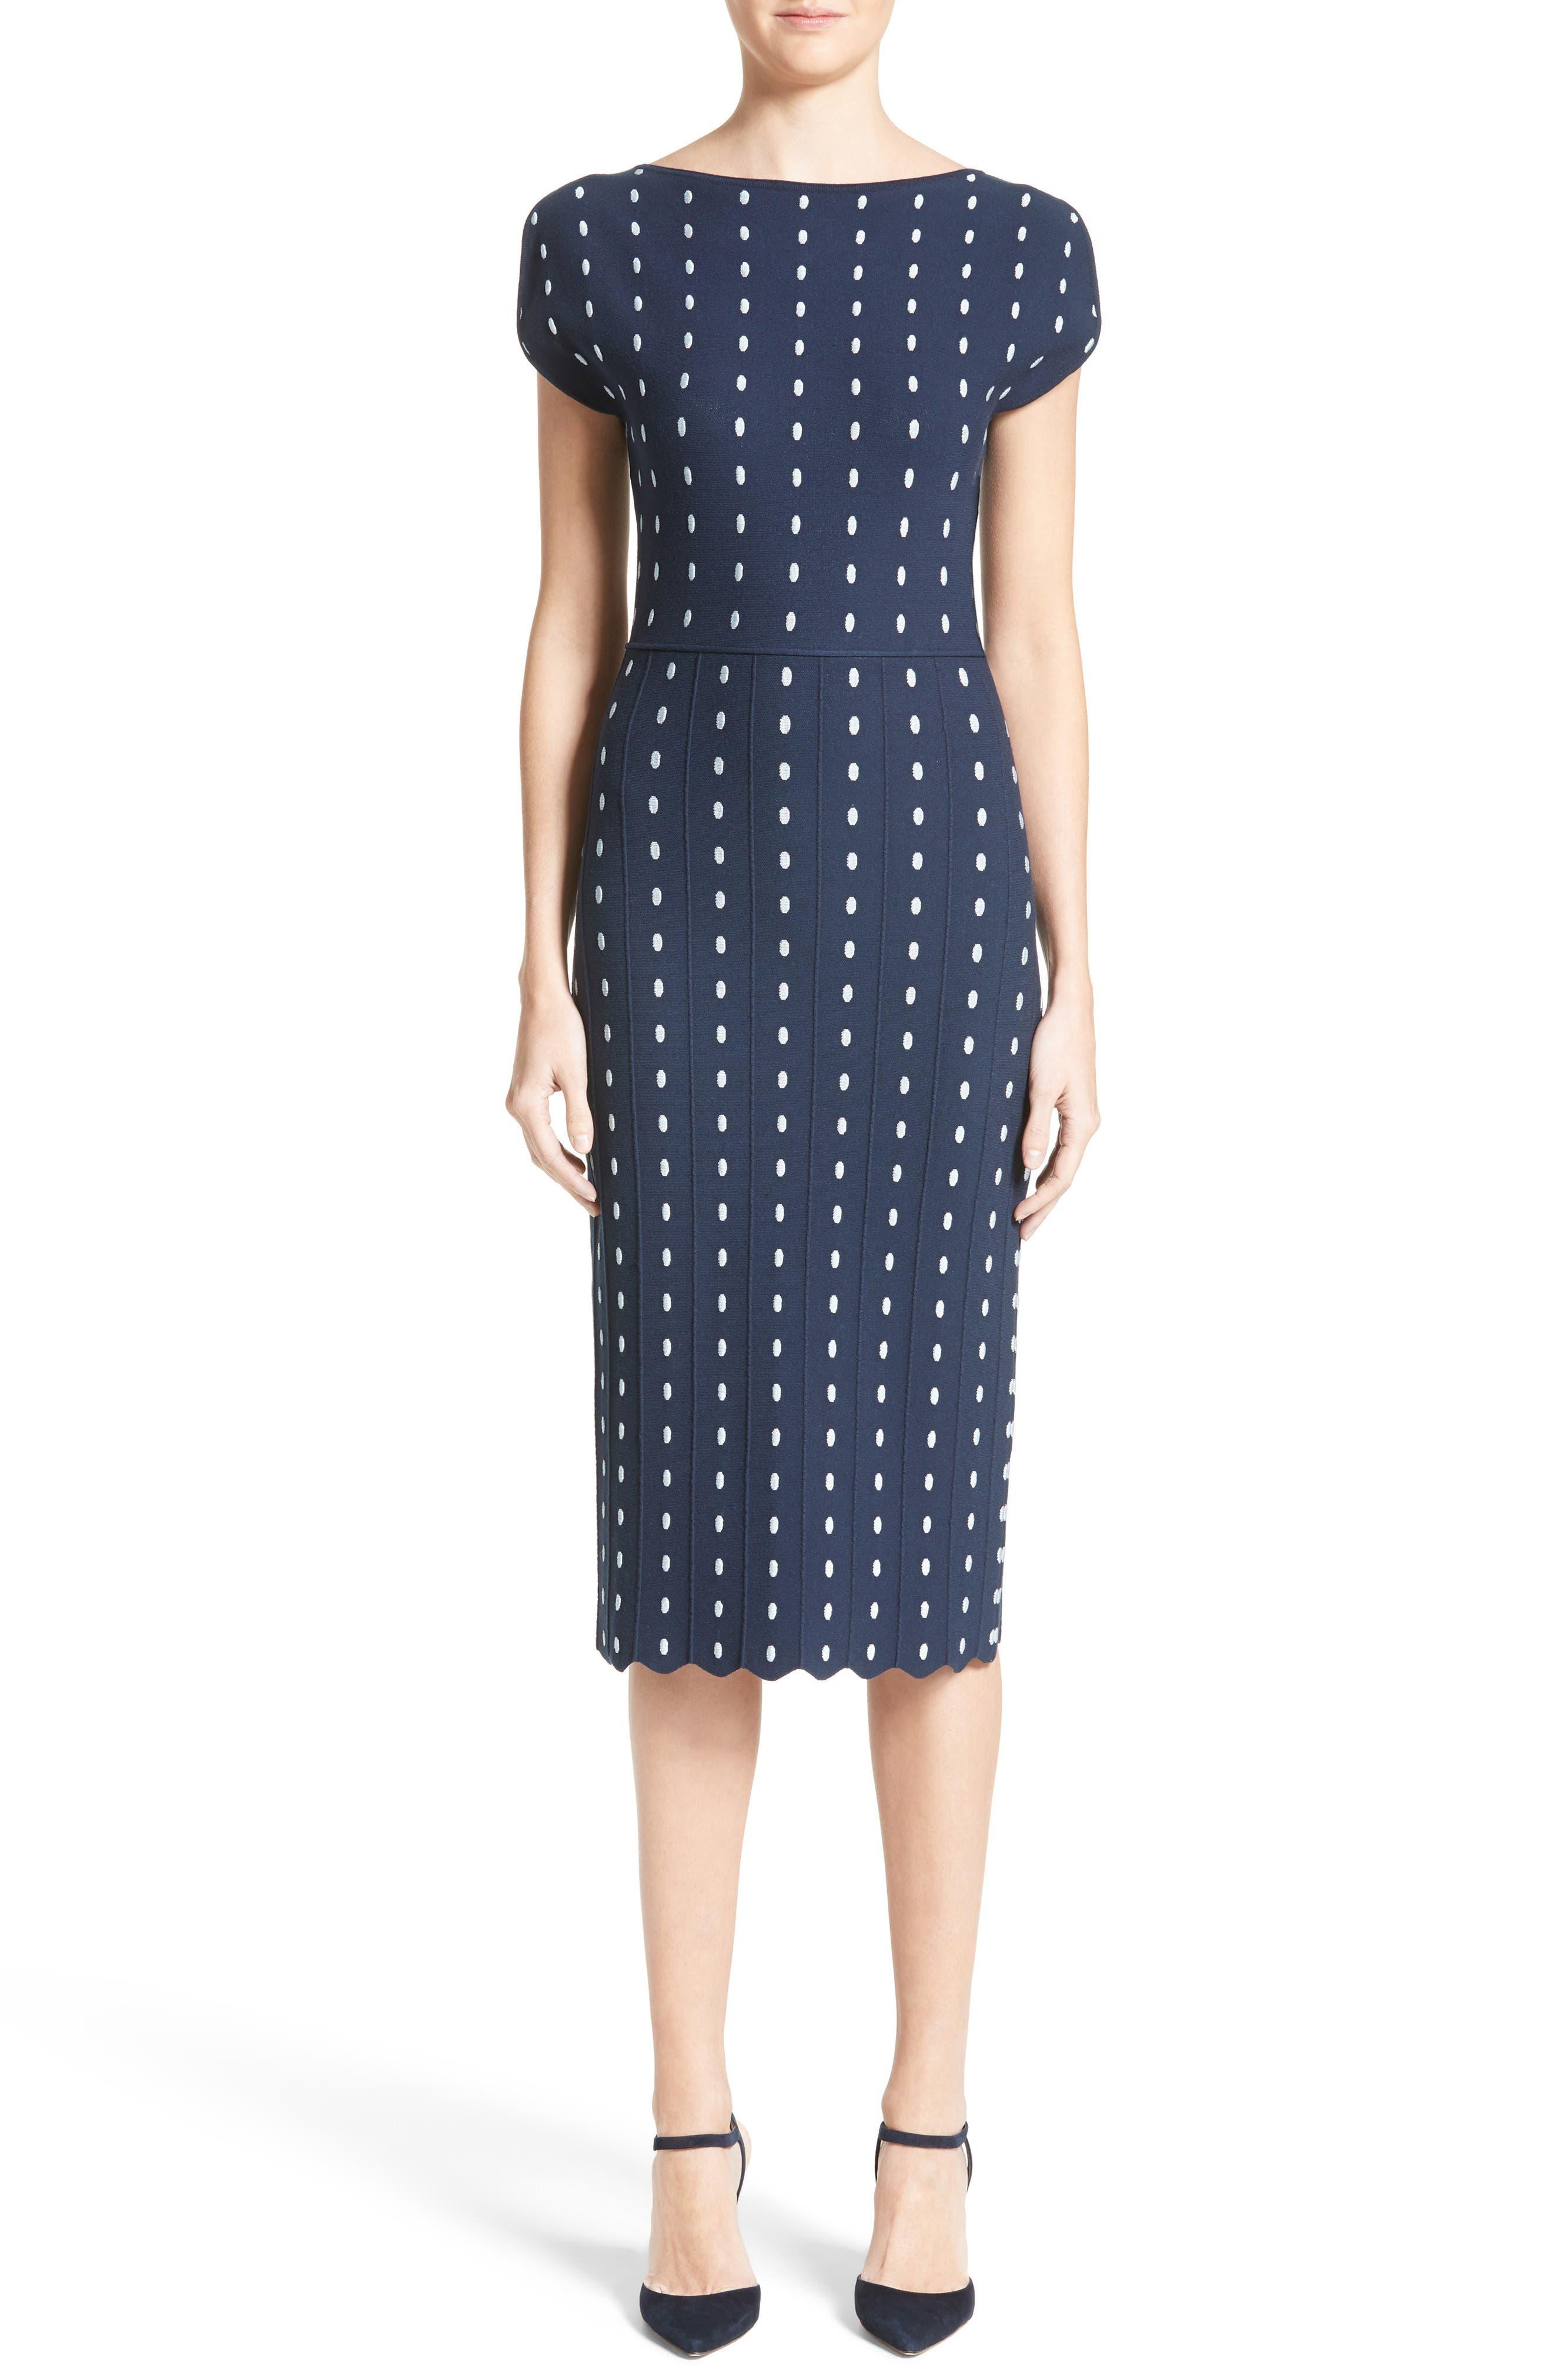 Alternate Image 1 Selected - Lela Rose Dot Knit Sheath Dress